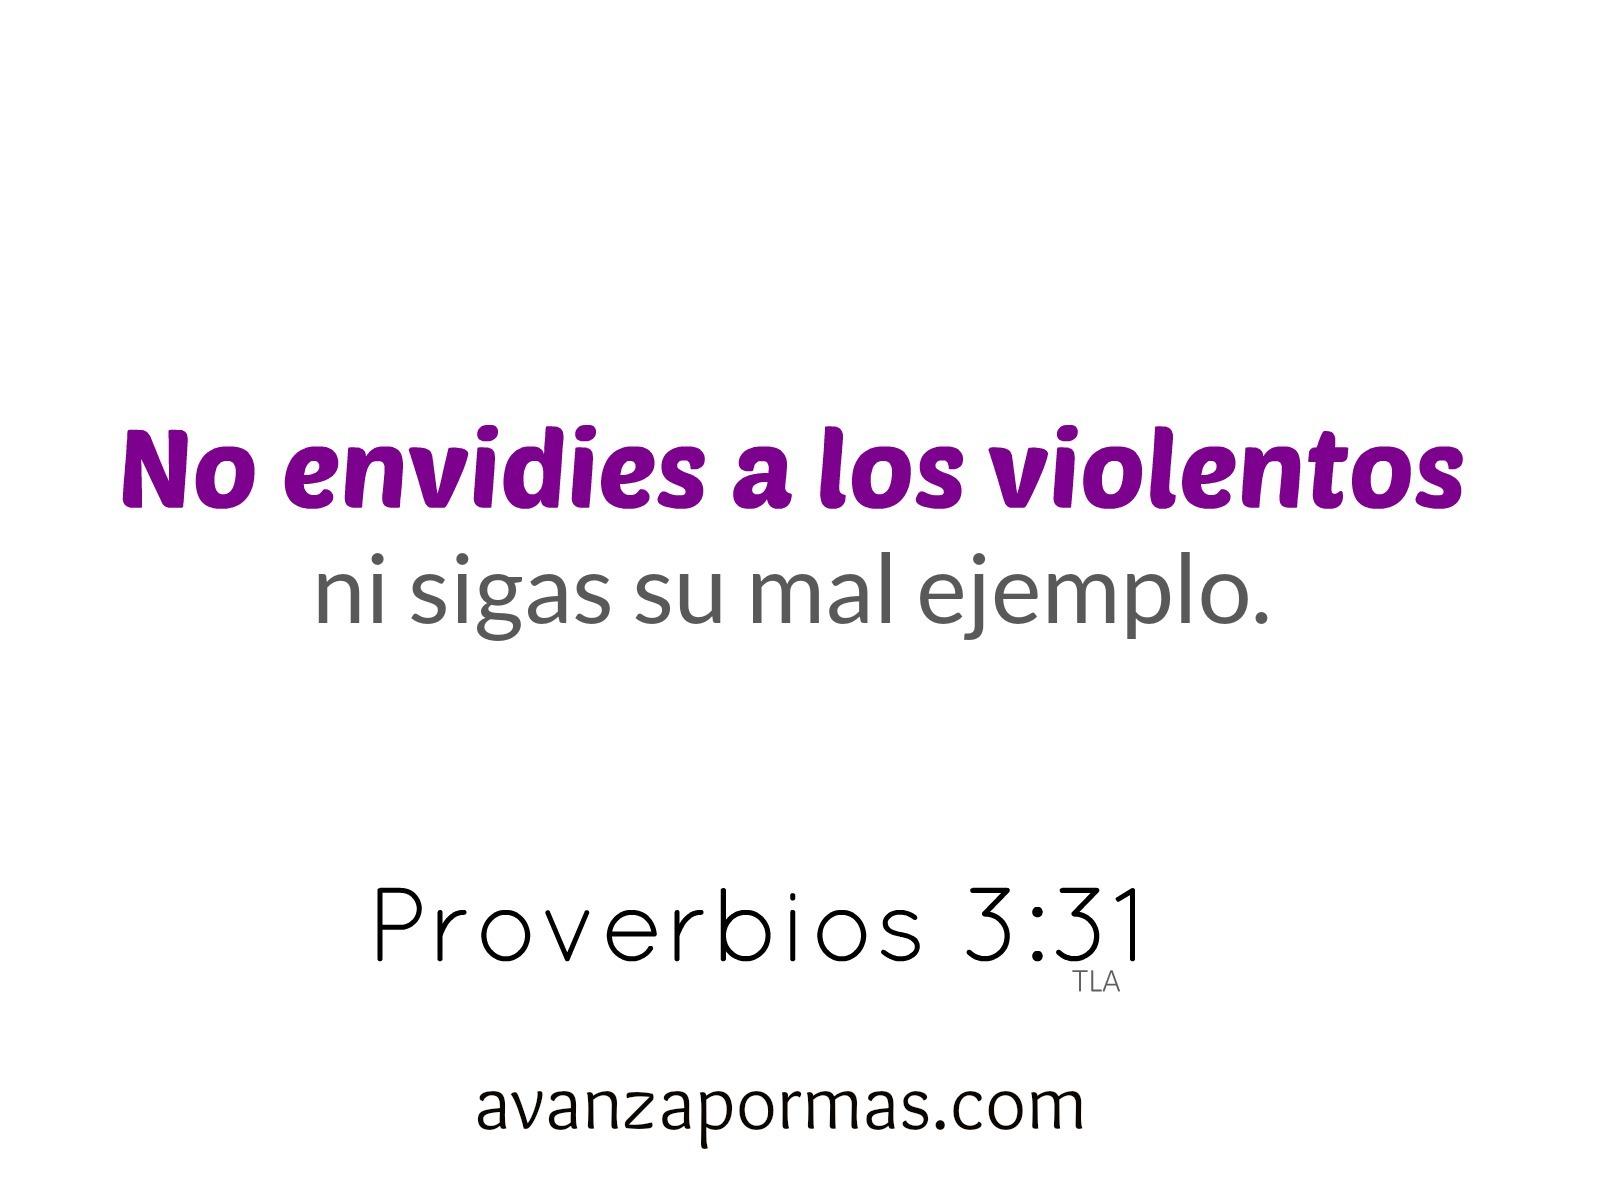 proverbios 10